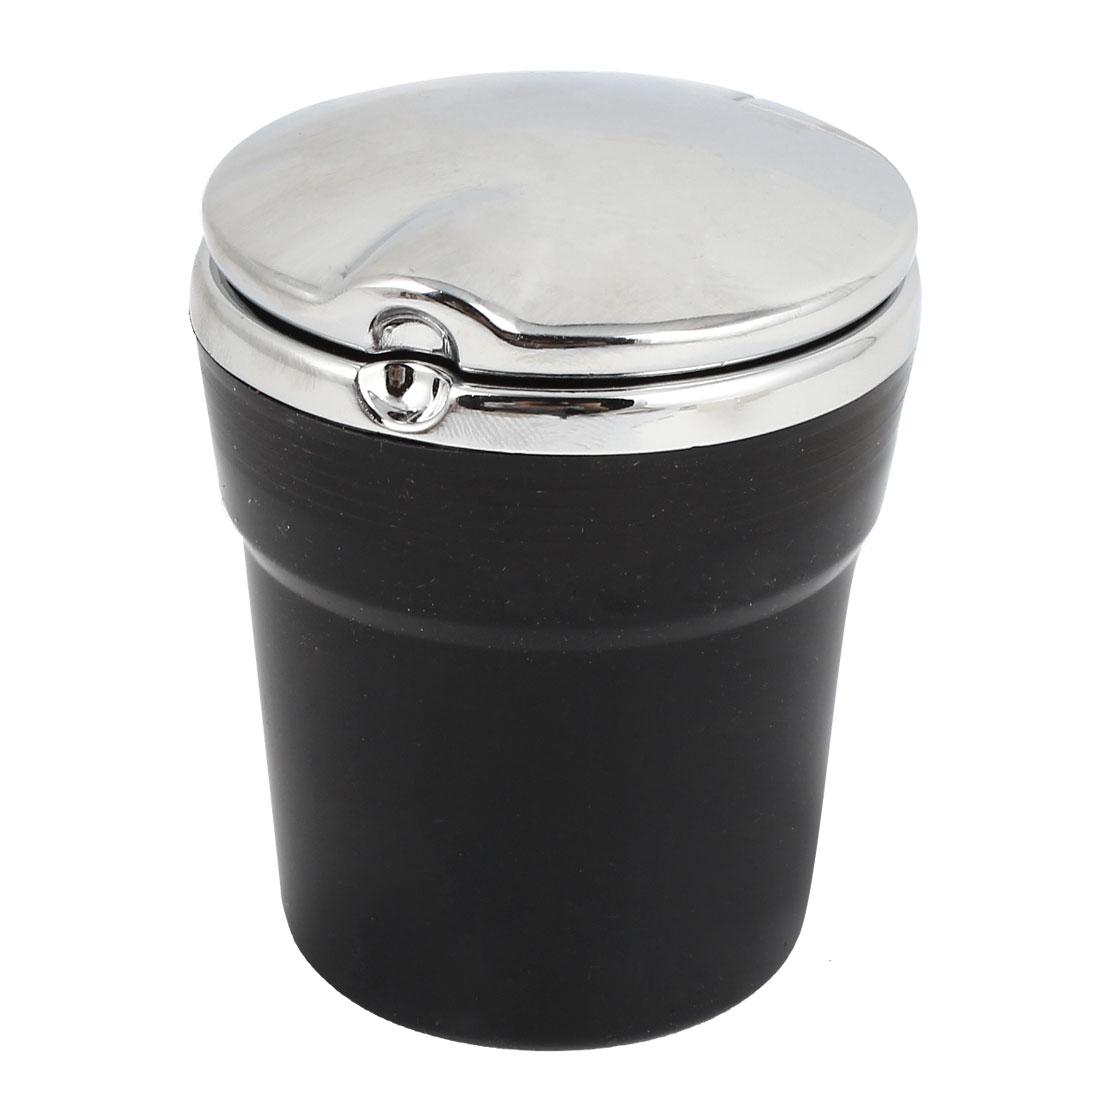 Black Silver Tone Cylinder Shaped Blue LED Light Car Cigarette Ashtray Holder